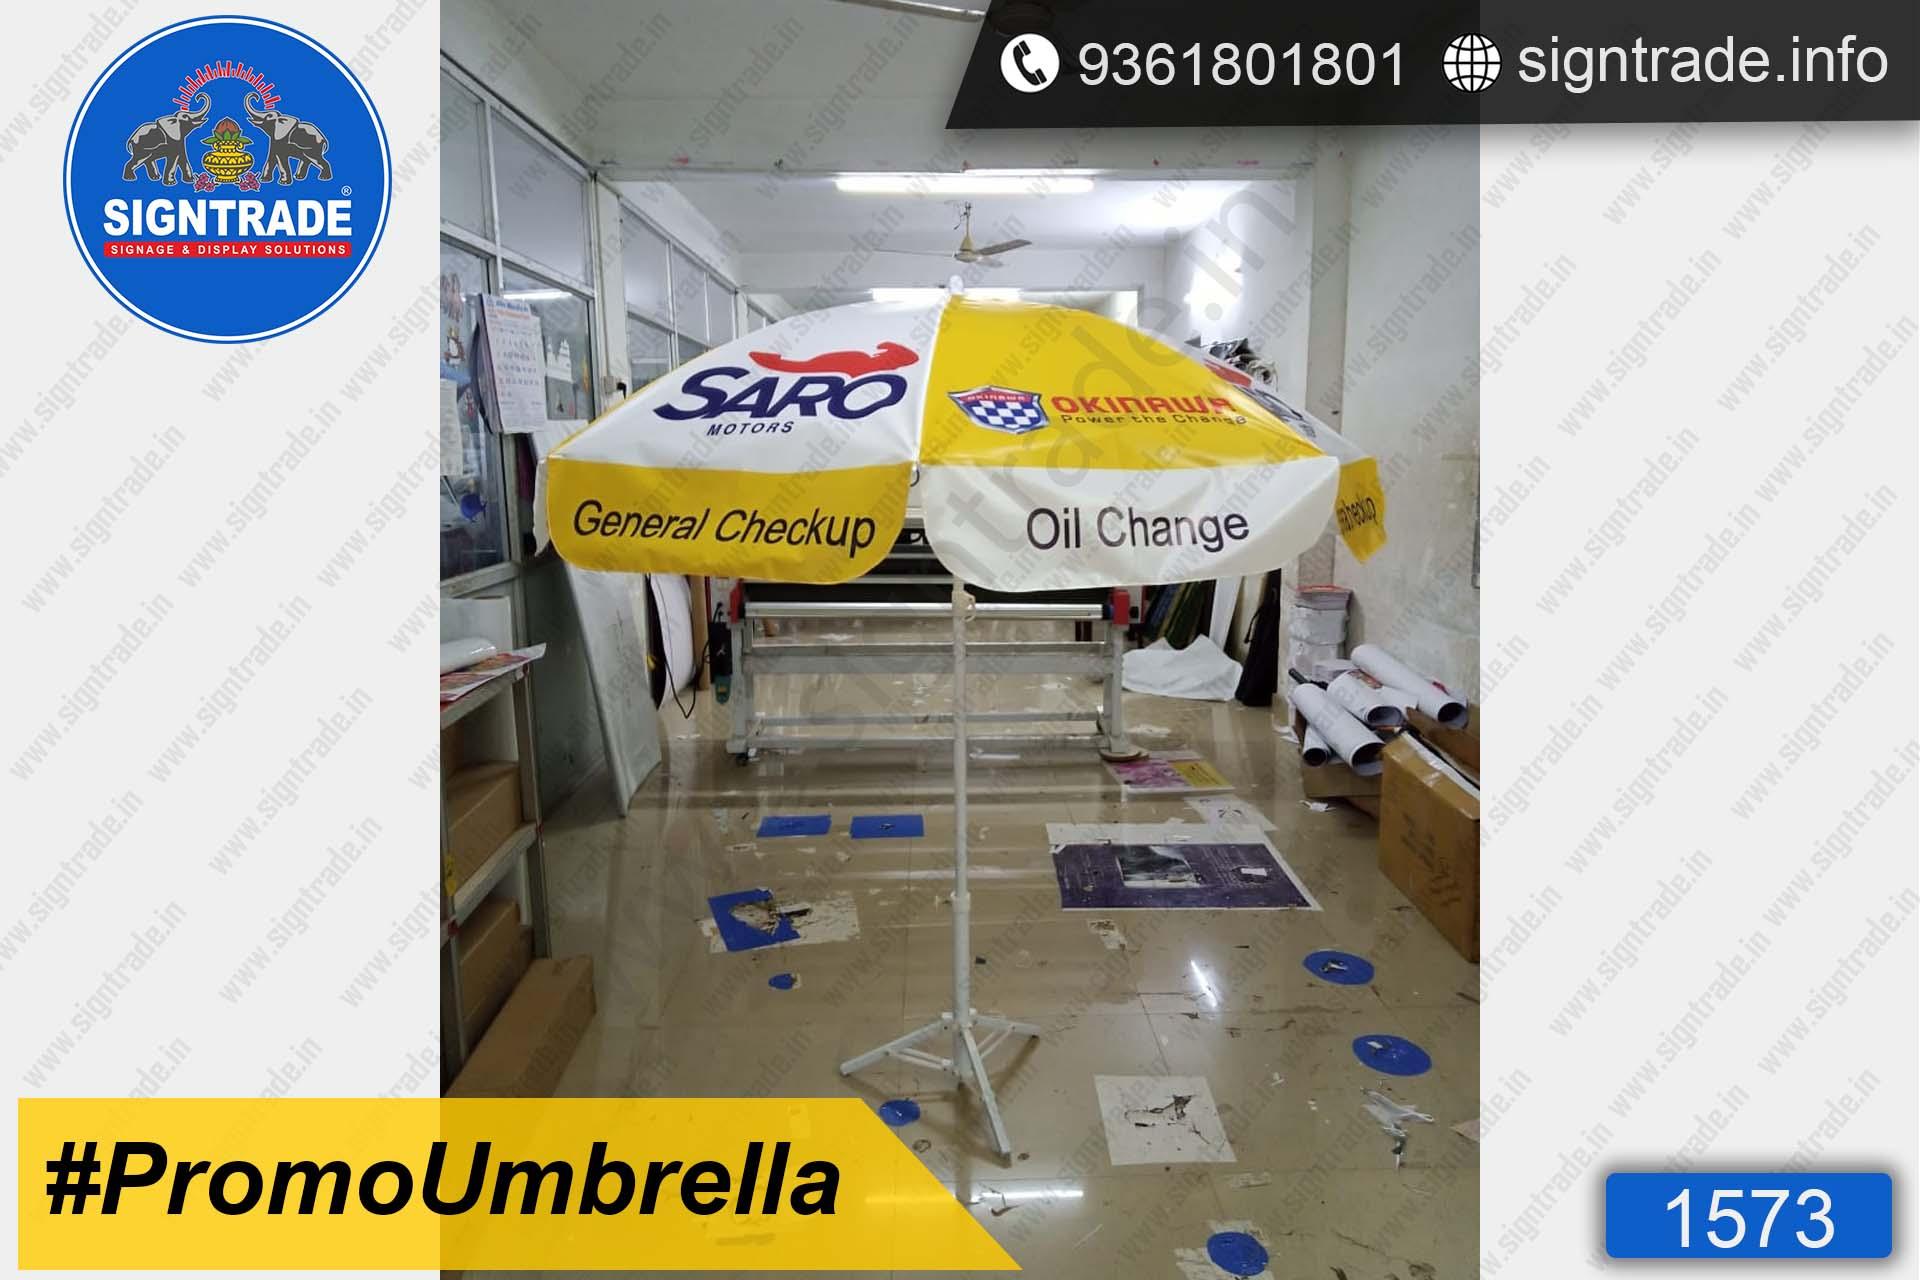 Saro Motors, Jayankondam - SIGNTRADE - Promotional Umbrella Manufactures in Chennai